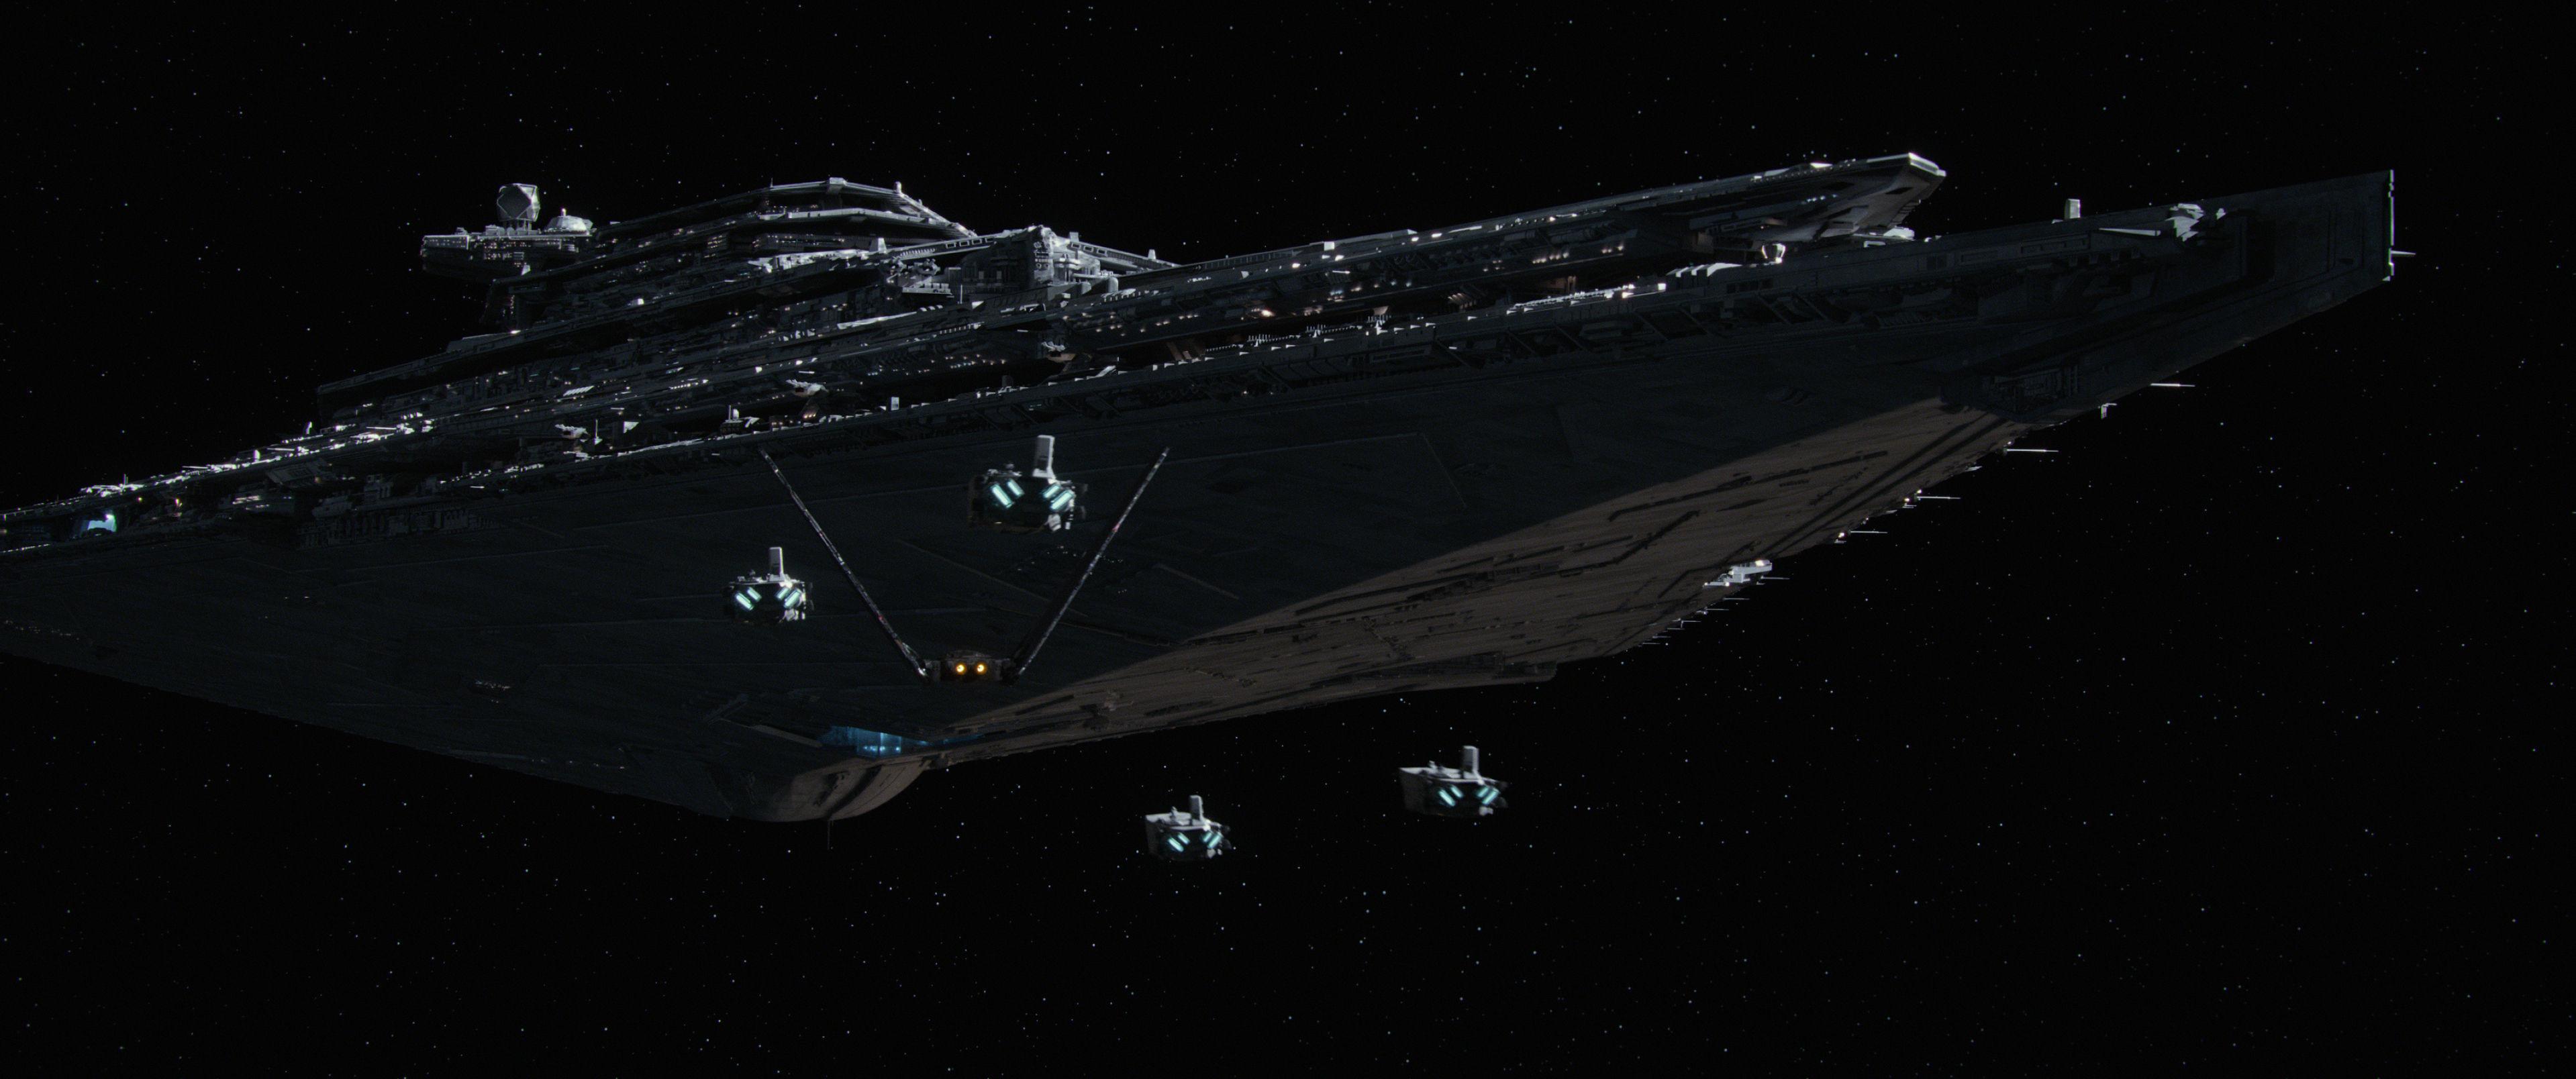 Star-Wars-7-Wallpaper-HD-The-Finalizer